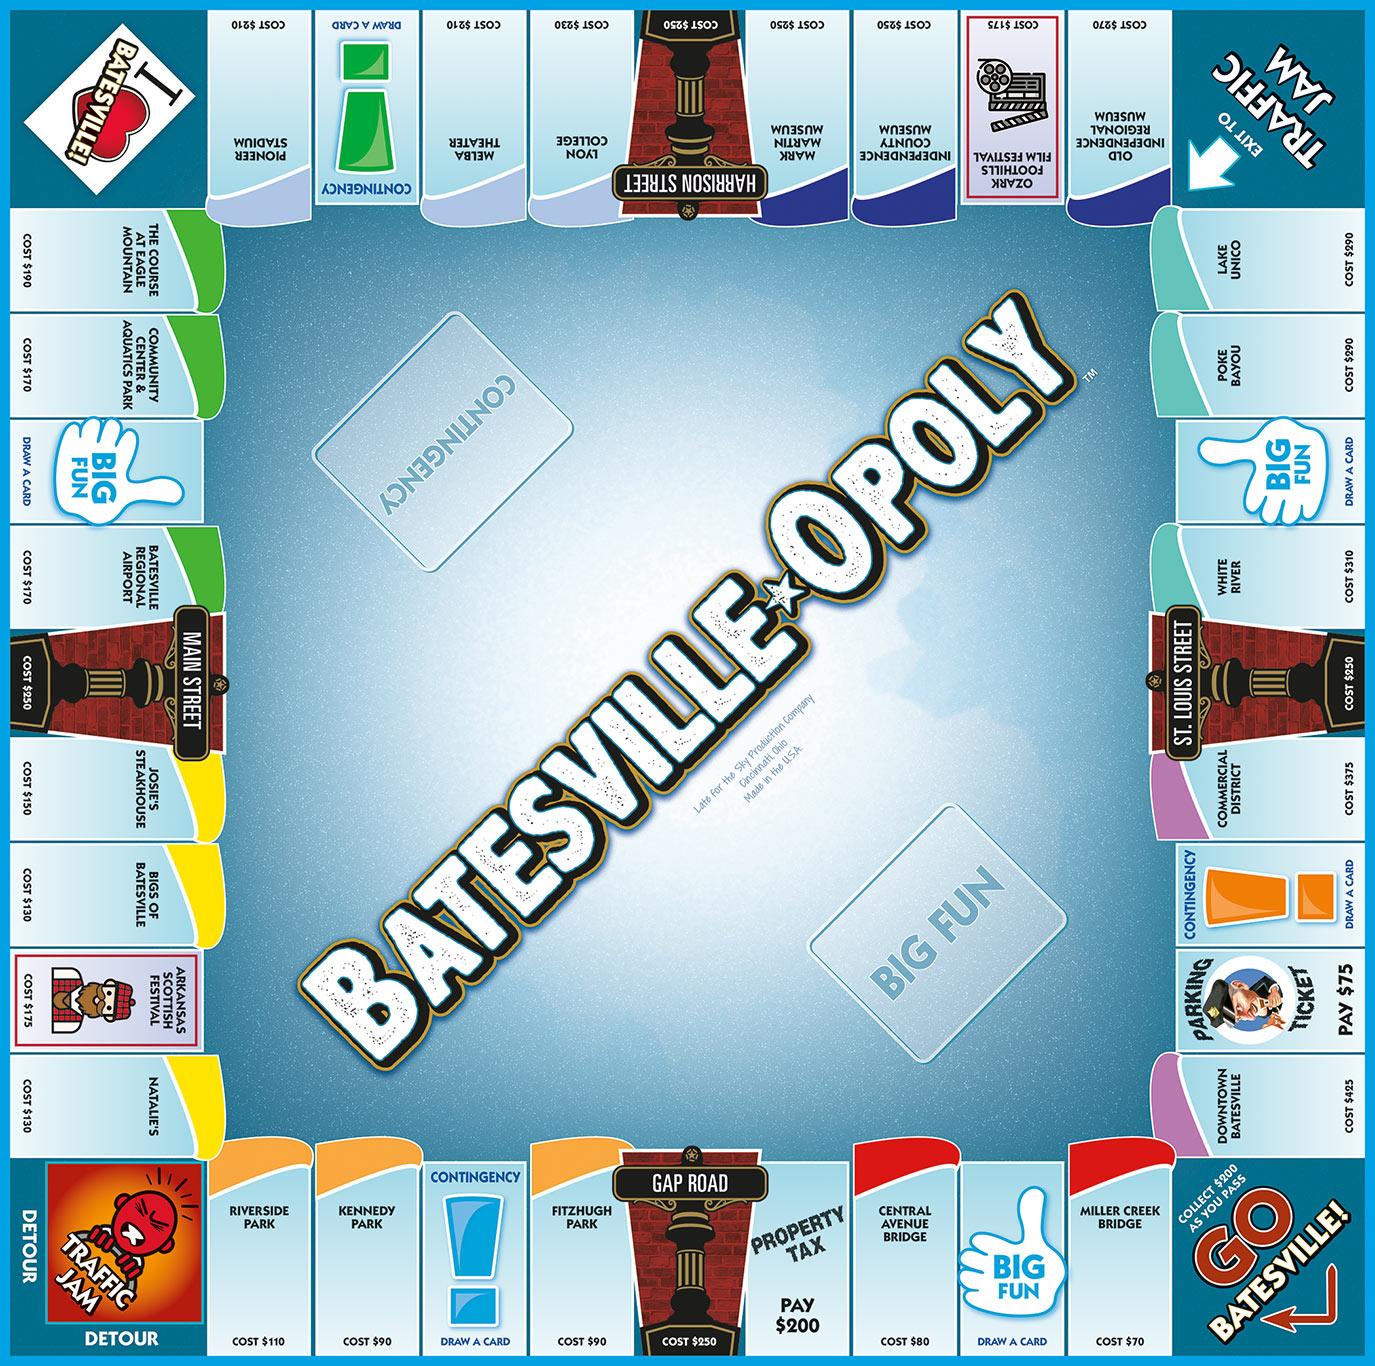 BATESVILLE-OPOLY Board Game